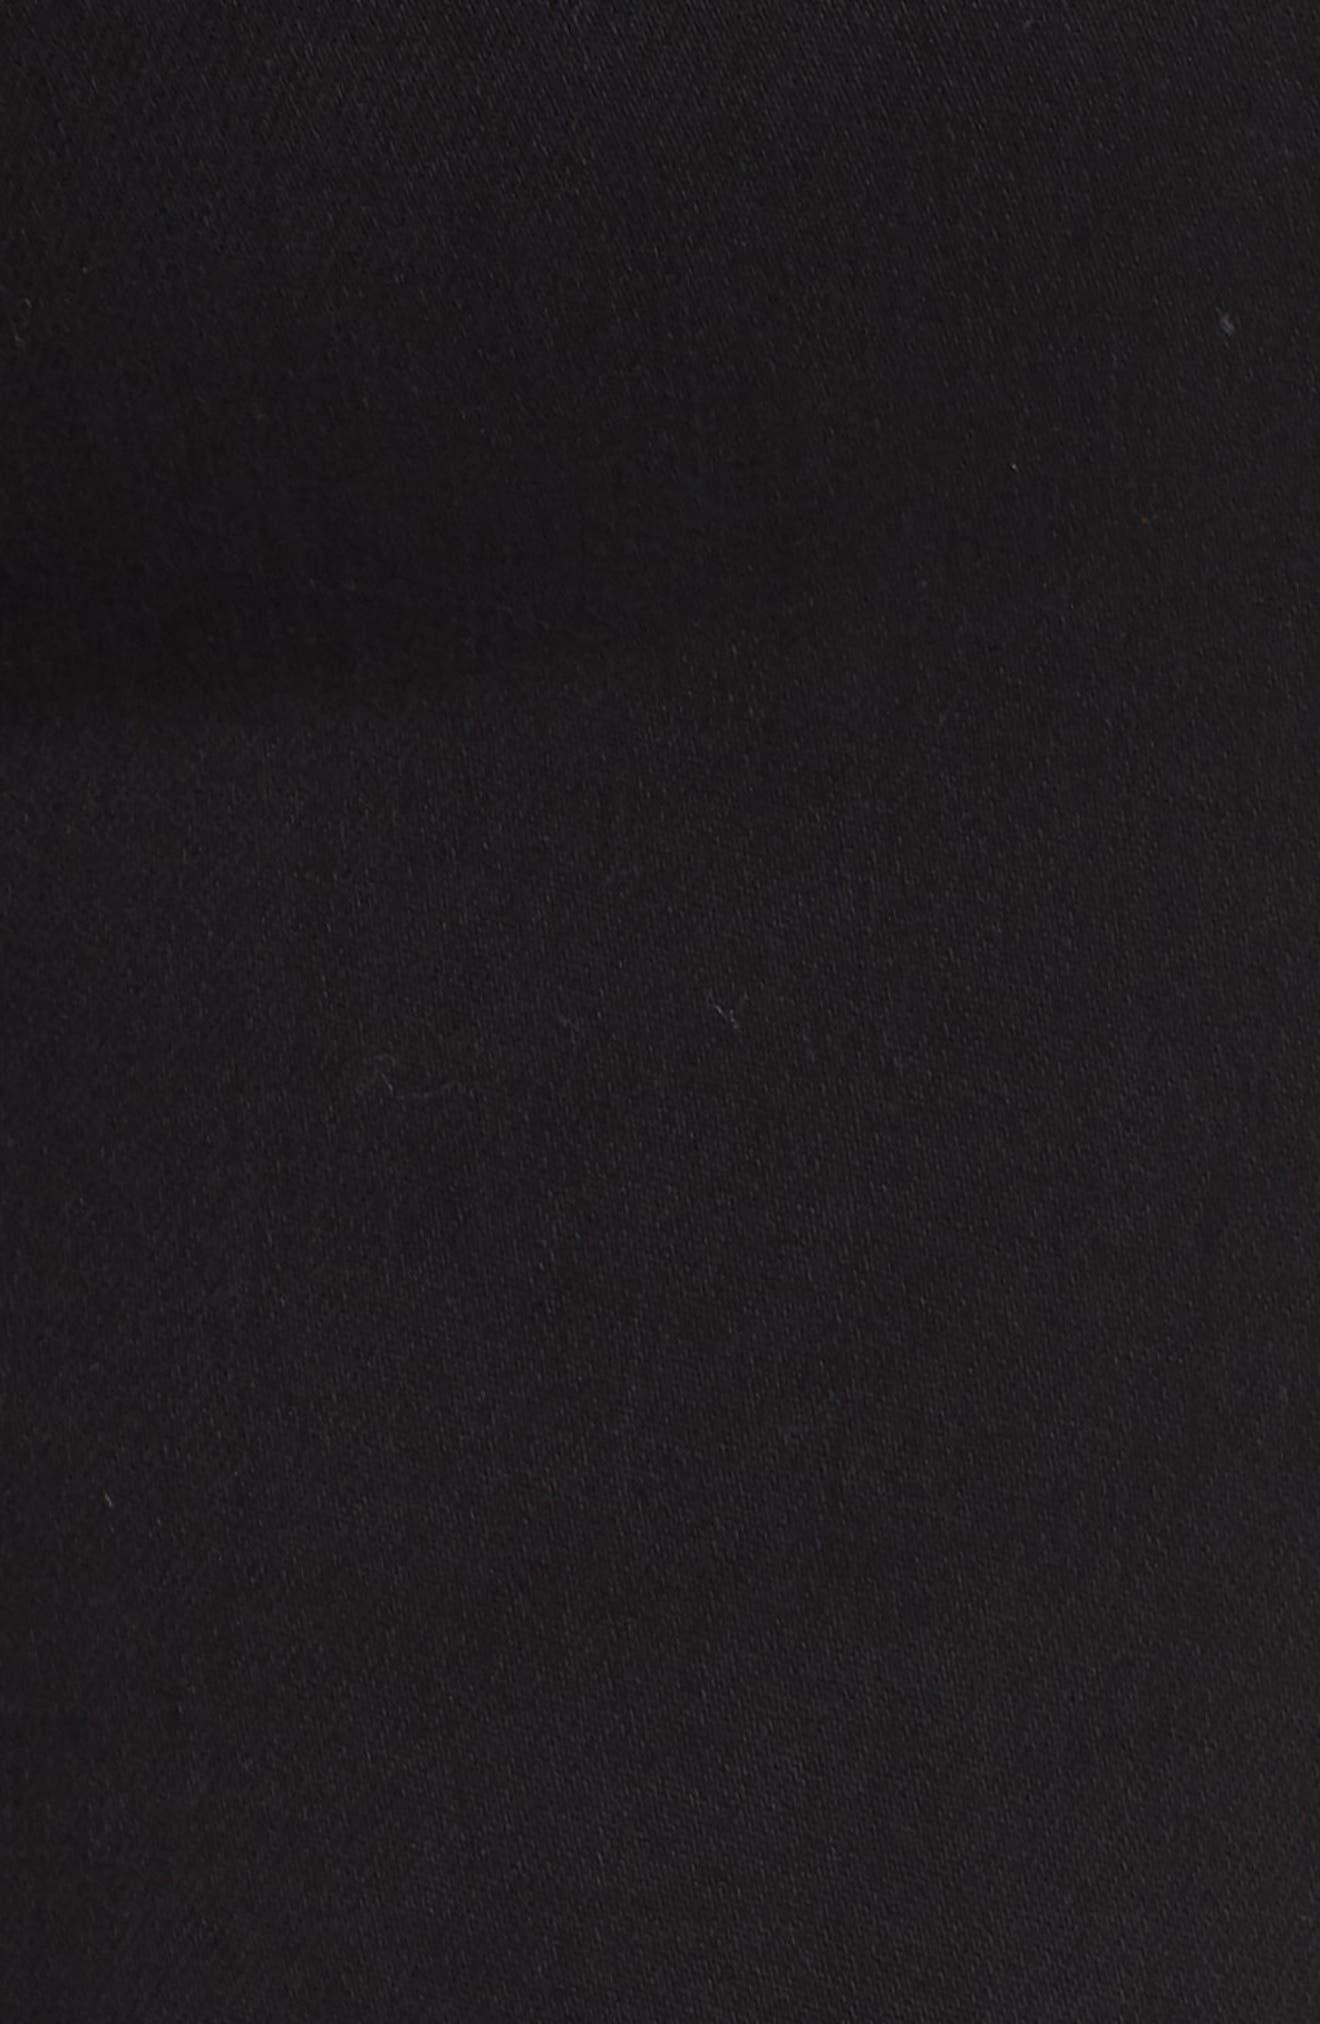 Fray Hem Ankle Skinny Jeans,                             Alternate thumbnail 6, color,                             BLACK RINSE WASH